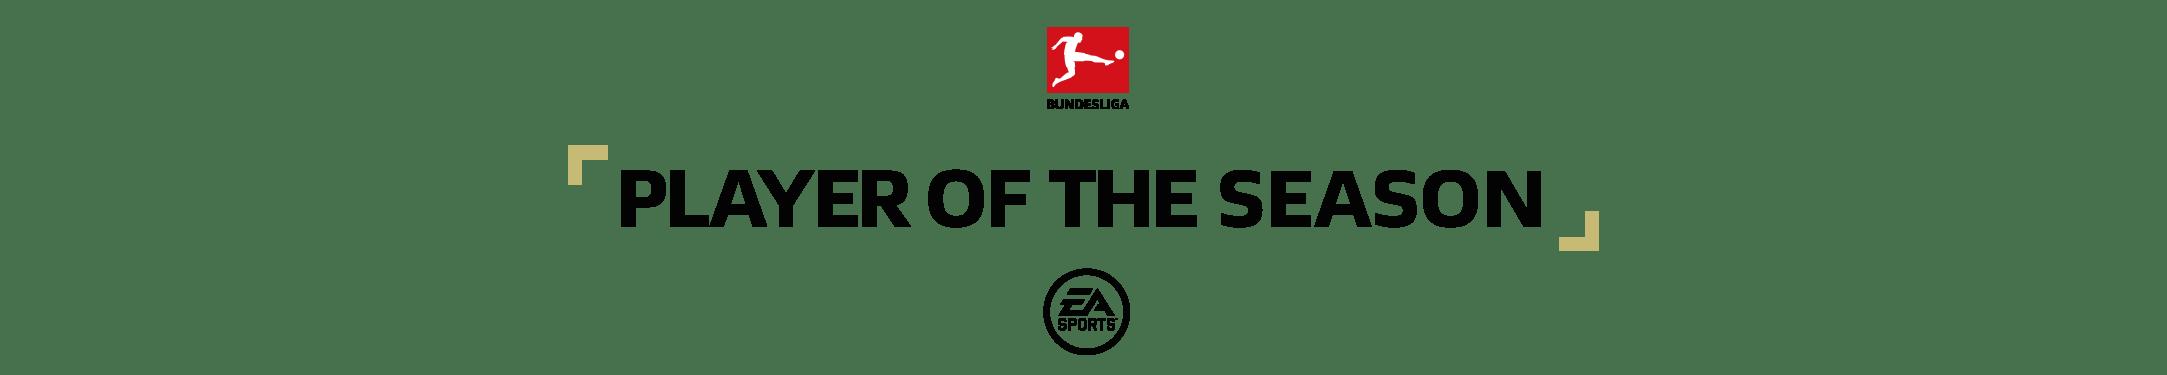 Player of the season